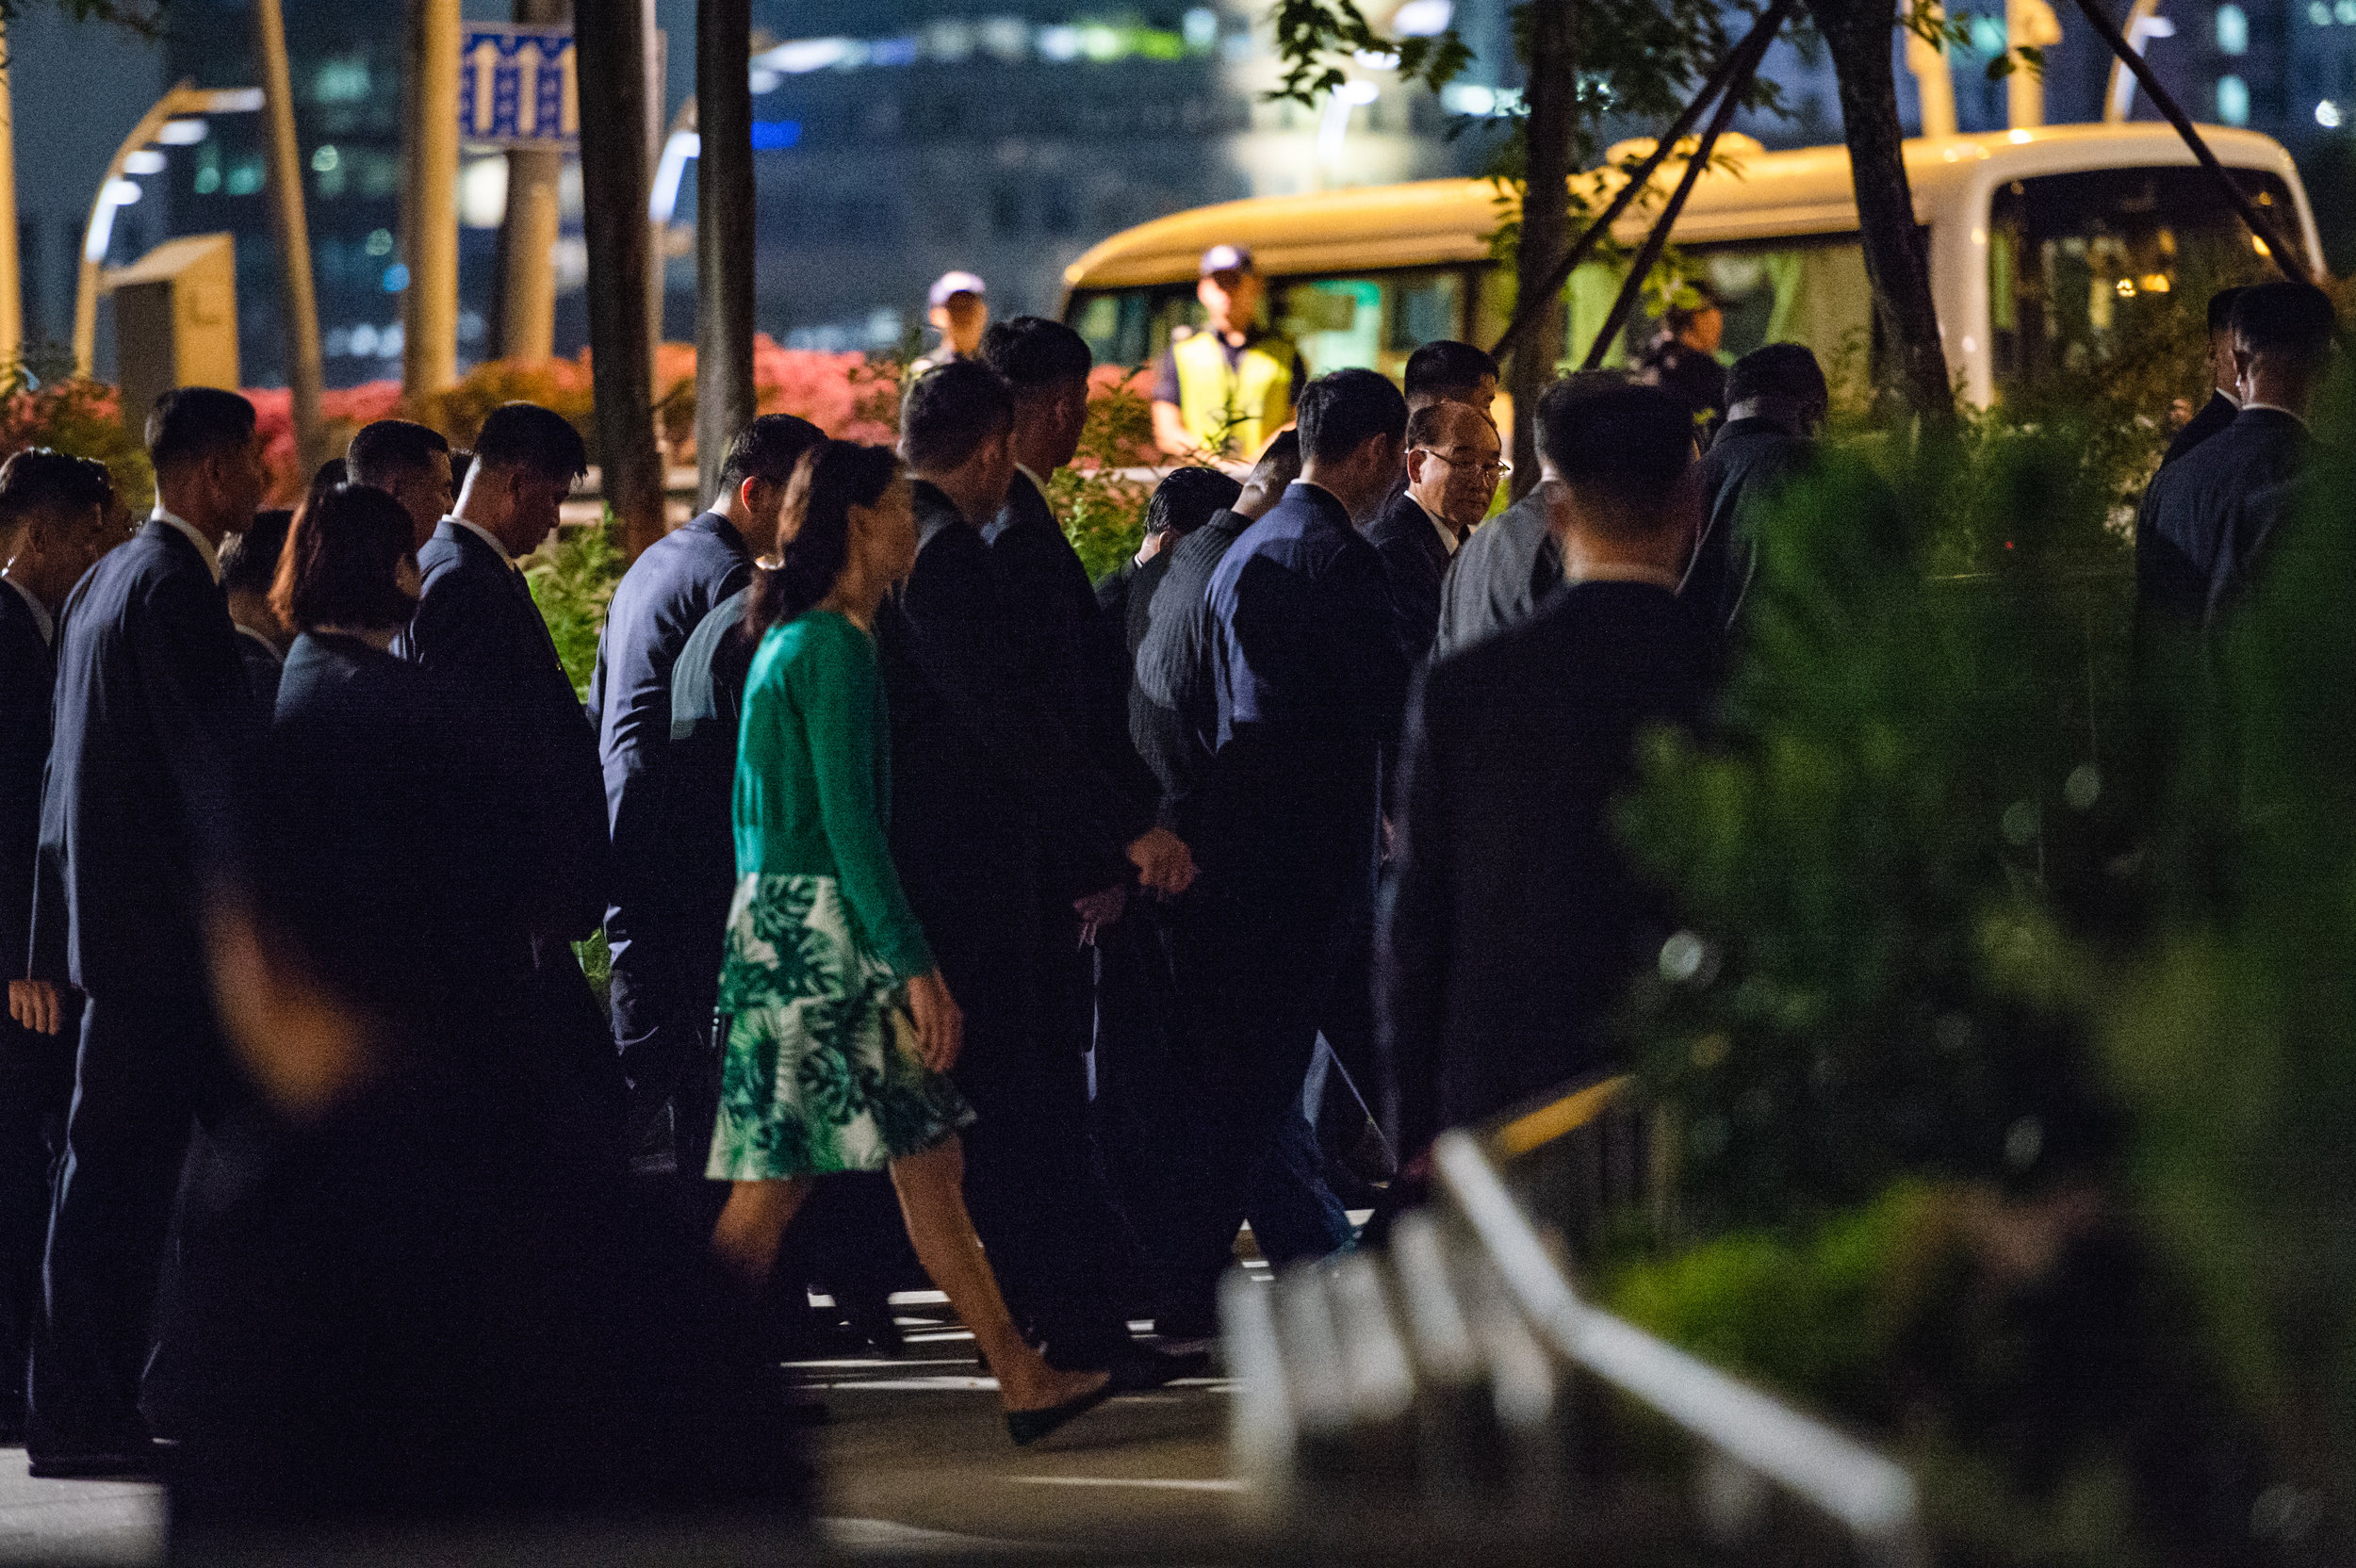 2018-06-11 - The Coincidental Kim Jong Un Esplanade Visit (11 of 11).jpg